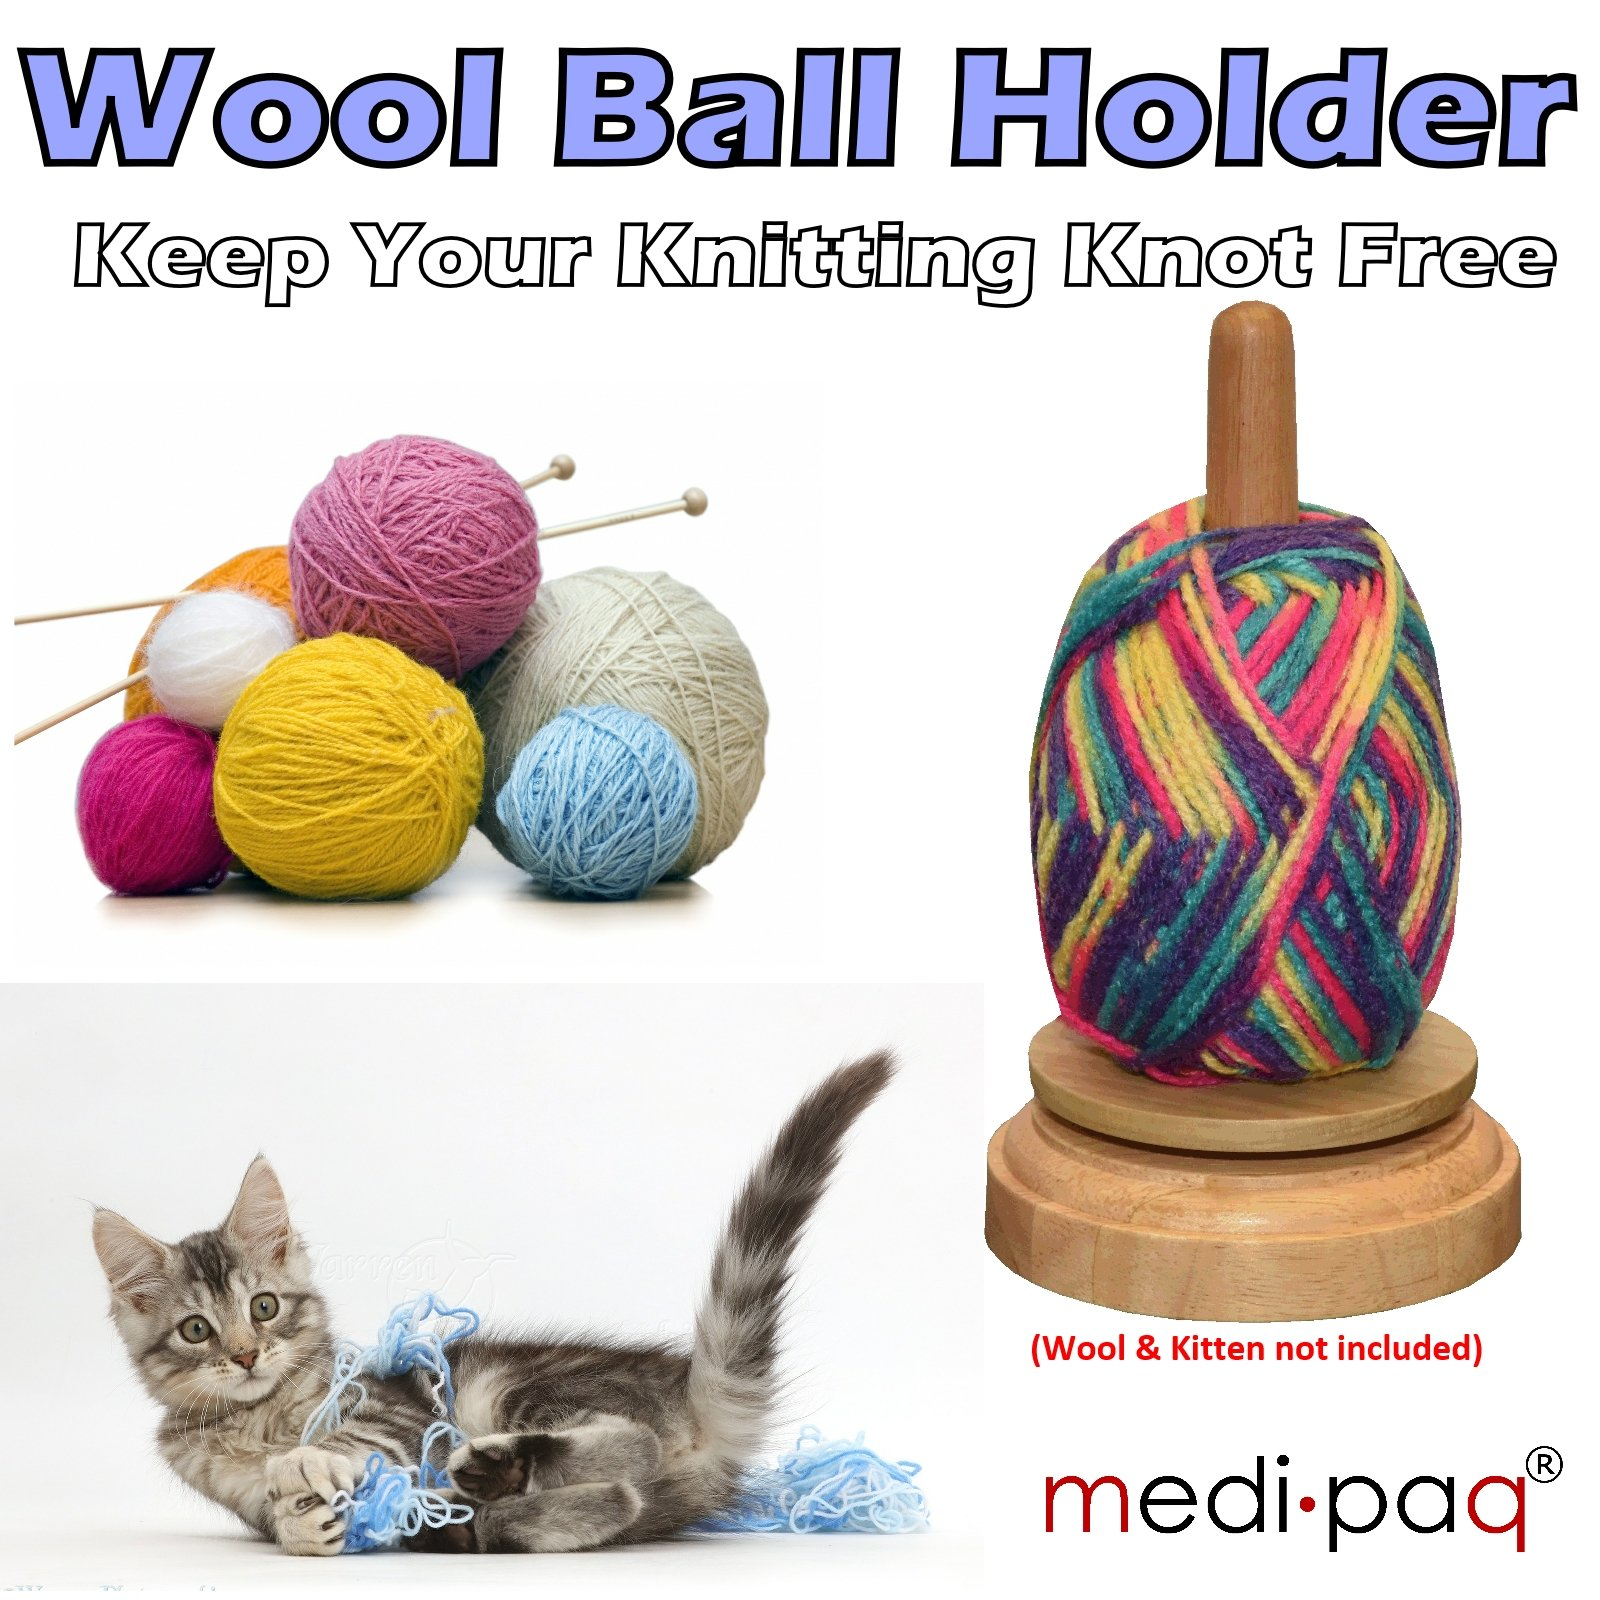 Wooden Knitting Wool Holder : New wooden revolving wool ball holder knitting knots